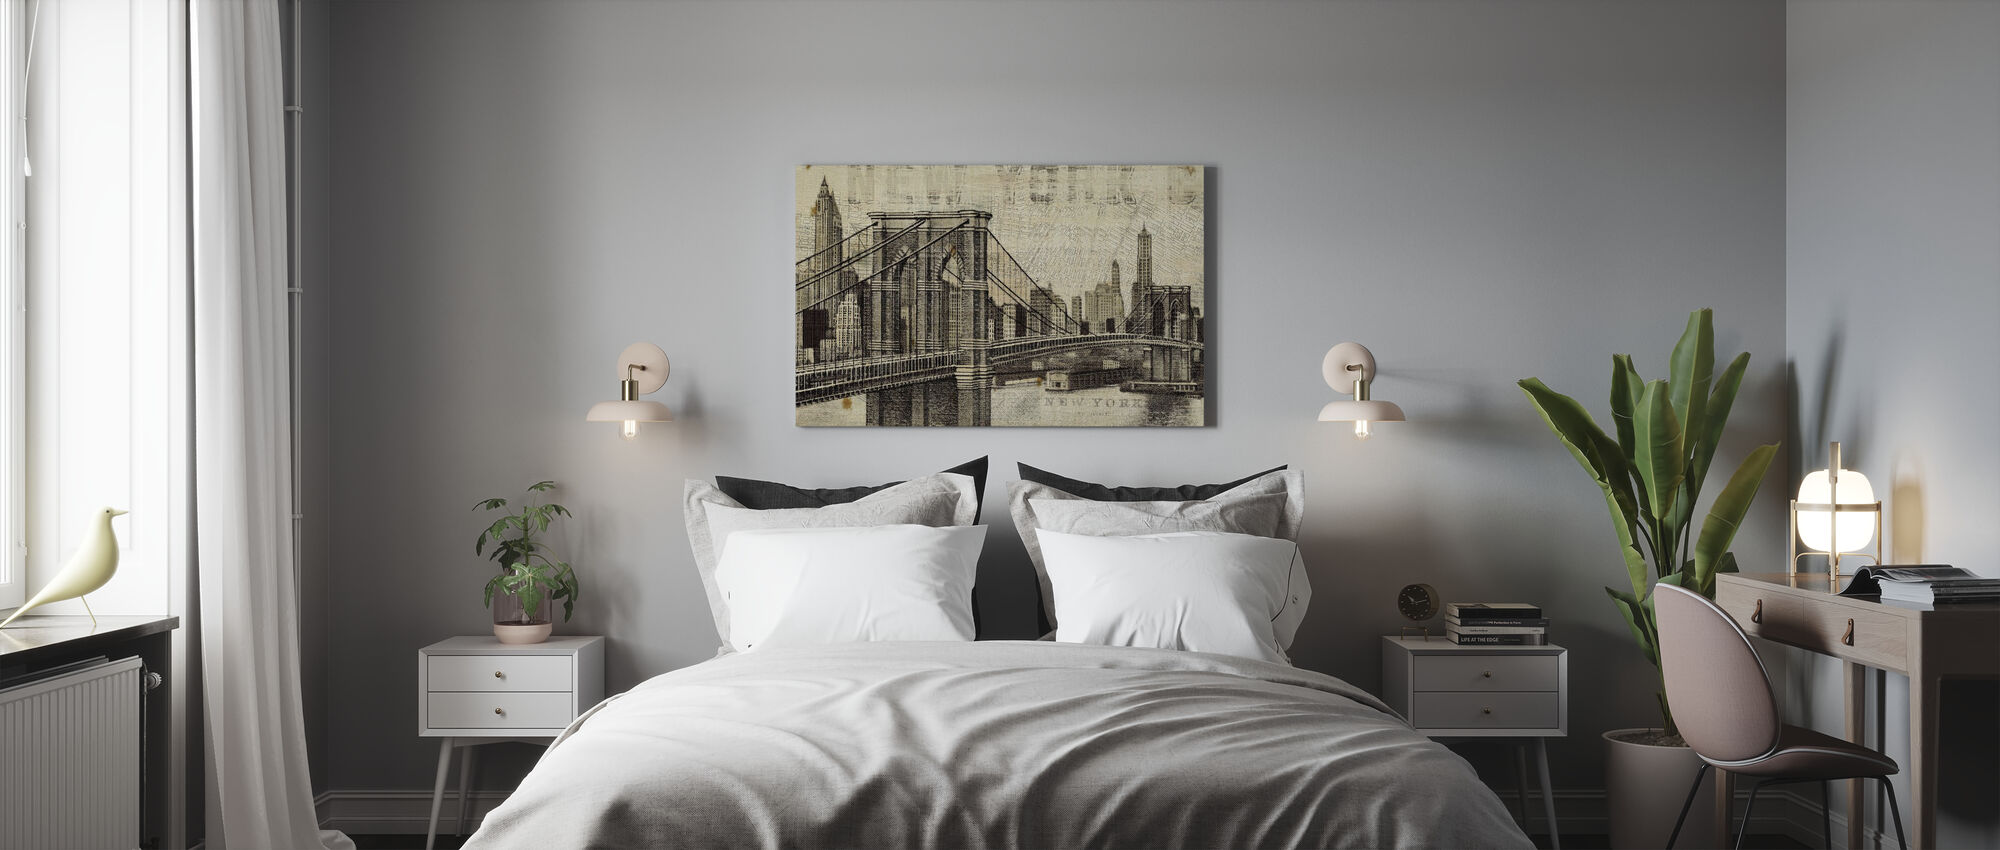 Vintage New York Brooklyn Bridge - Canvas print - Bedroom